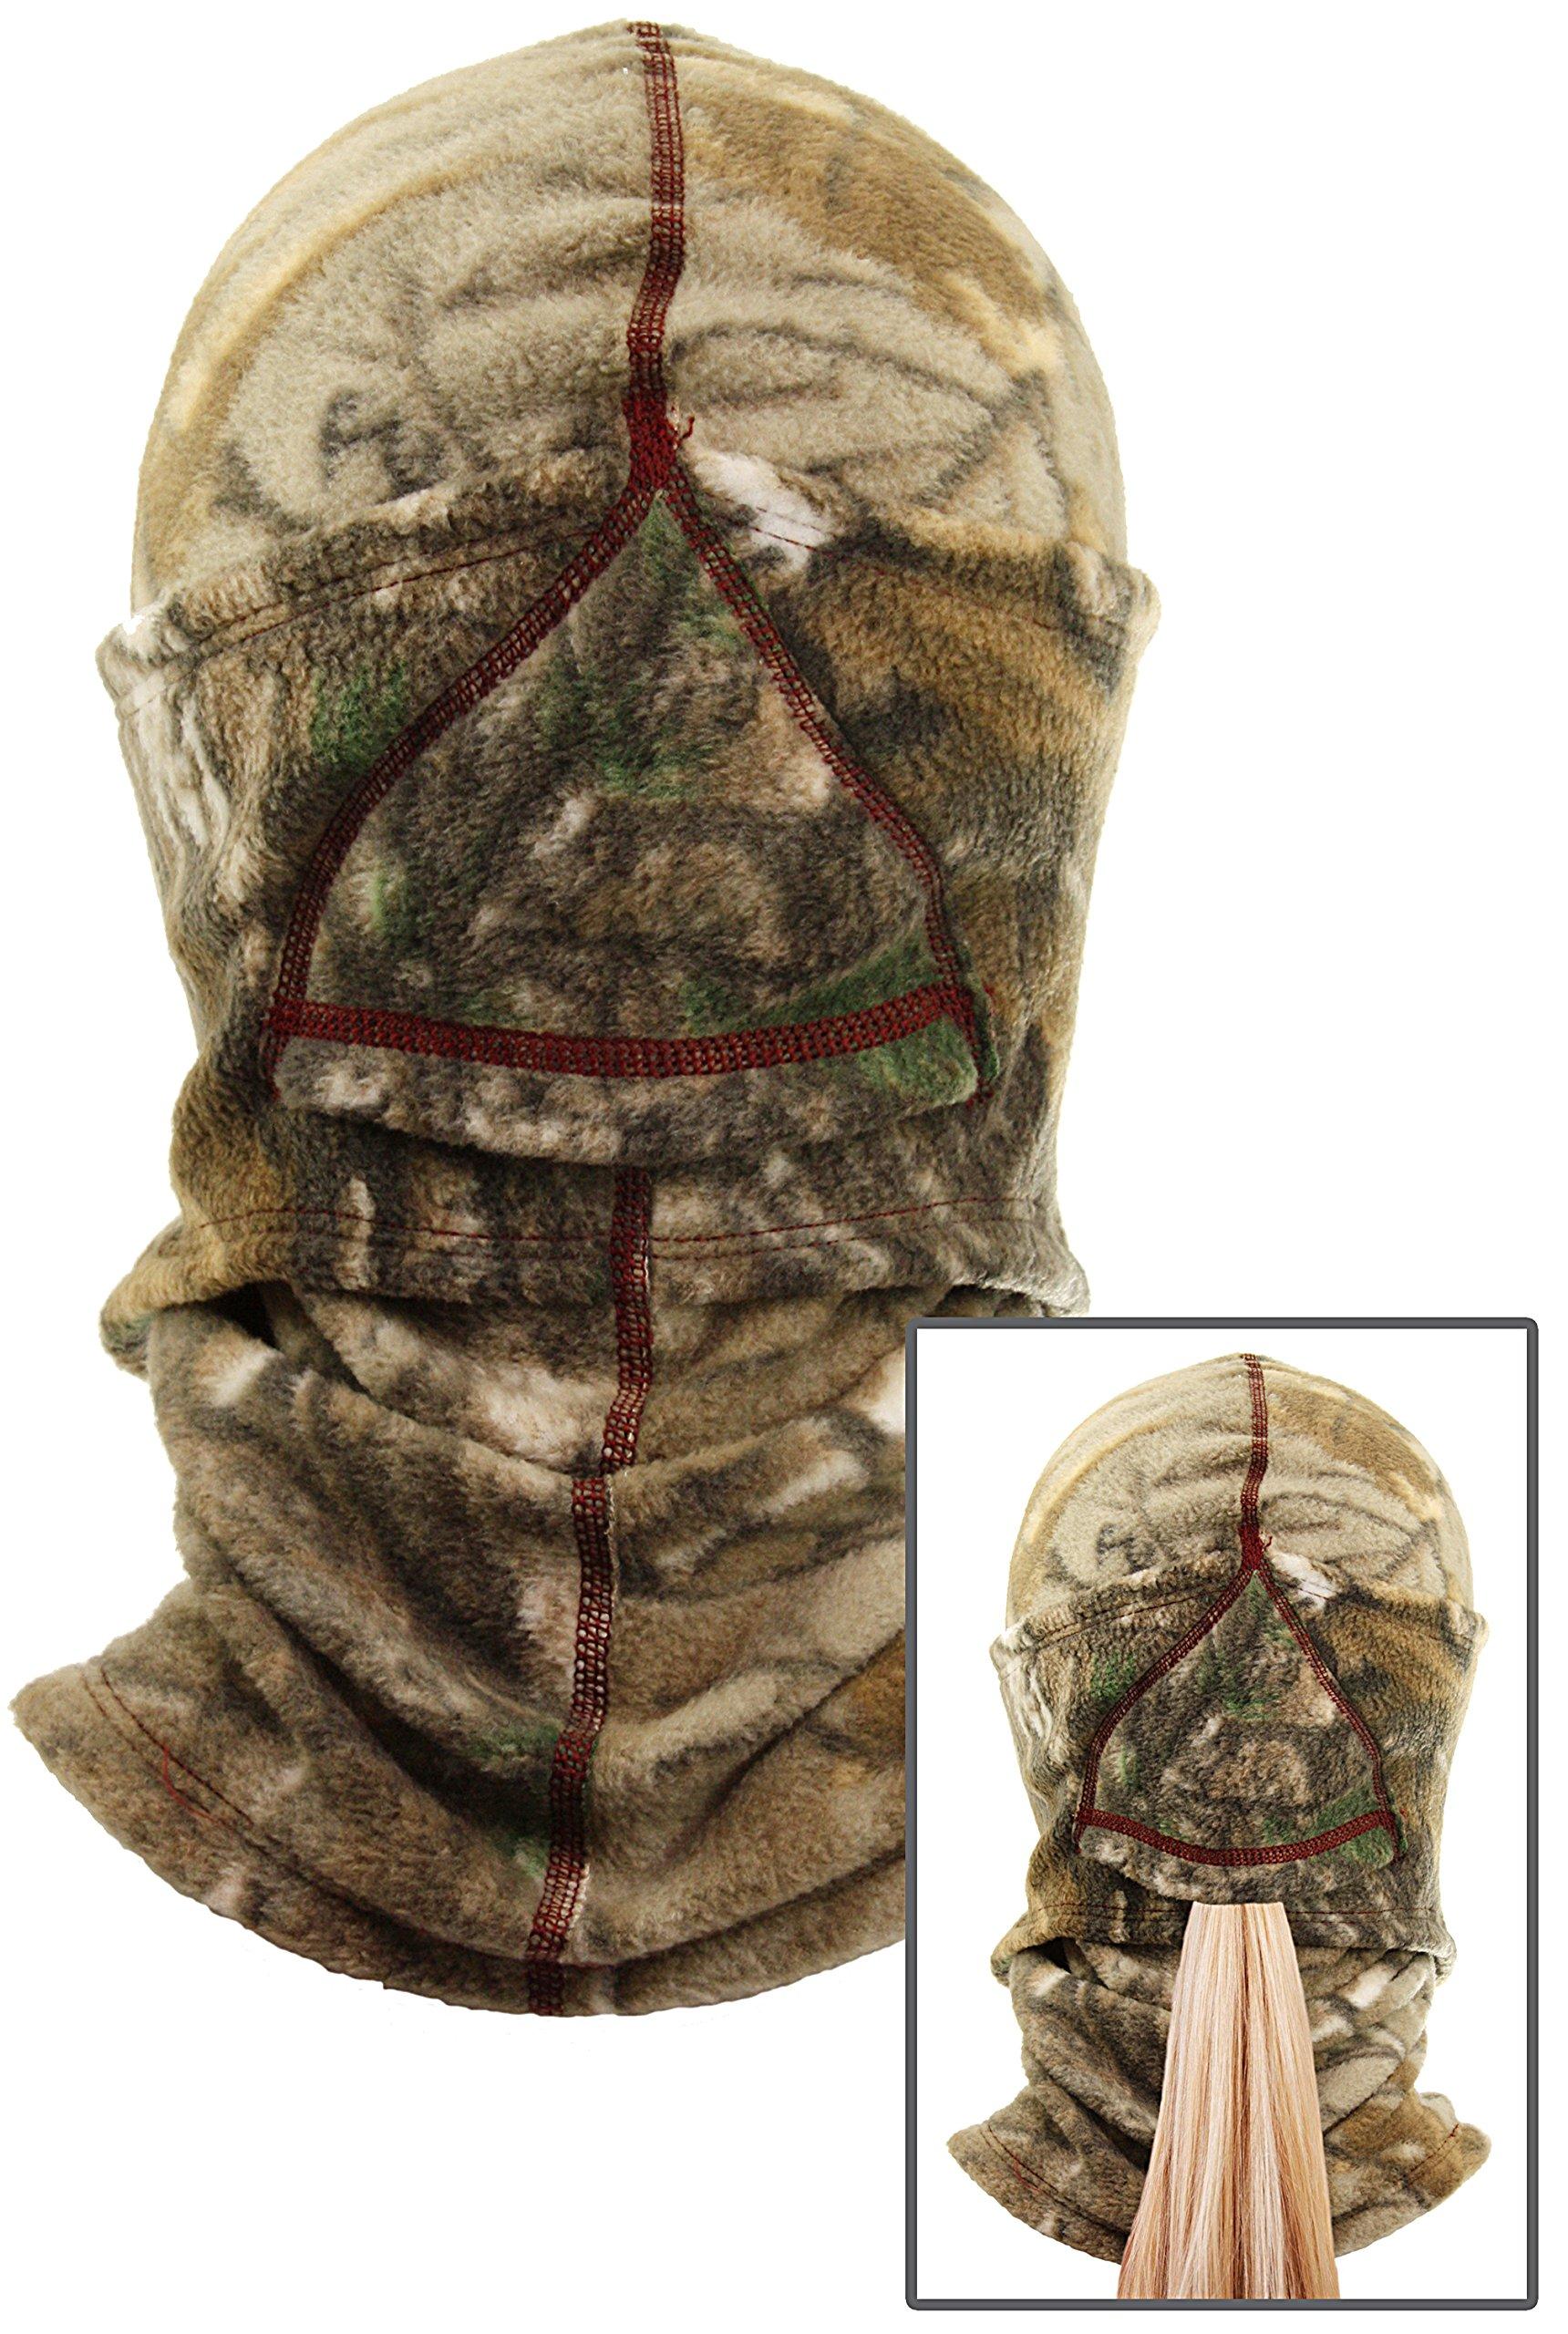 Equipment De Sport USA Ladies Camo Realtree Fleece Ninja Balaclava Face Mask with Ponytail Opening